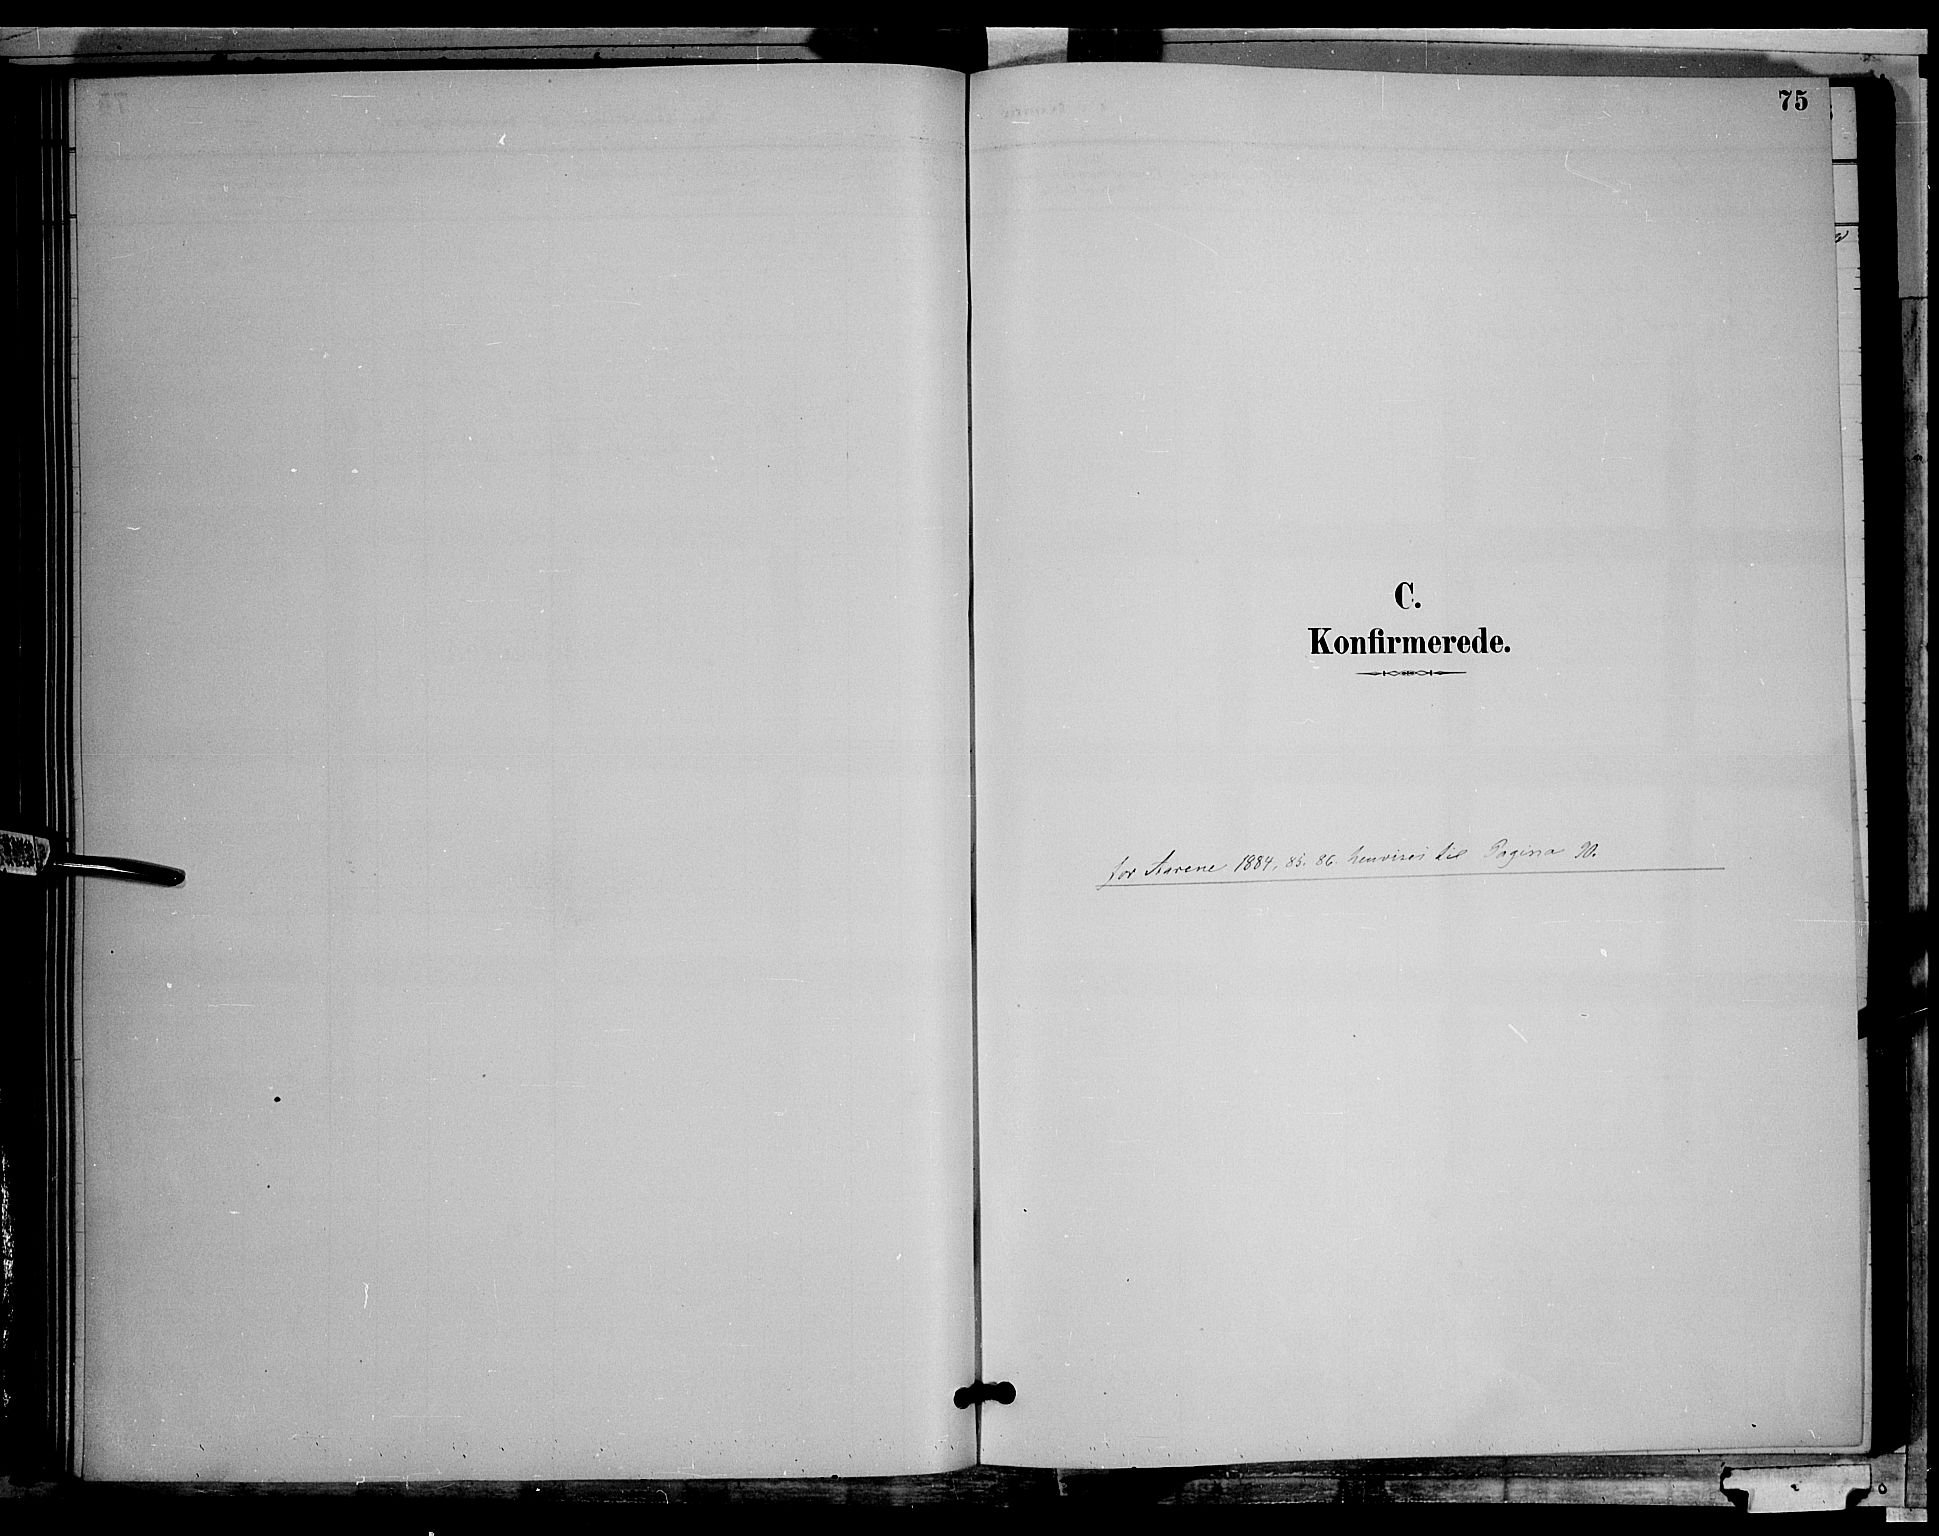 SAH, Søndre Land prestekontor, L/L0002: Klokkerbok nr. 2, 1884-1900, s. 75